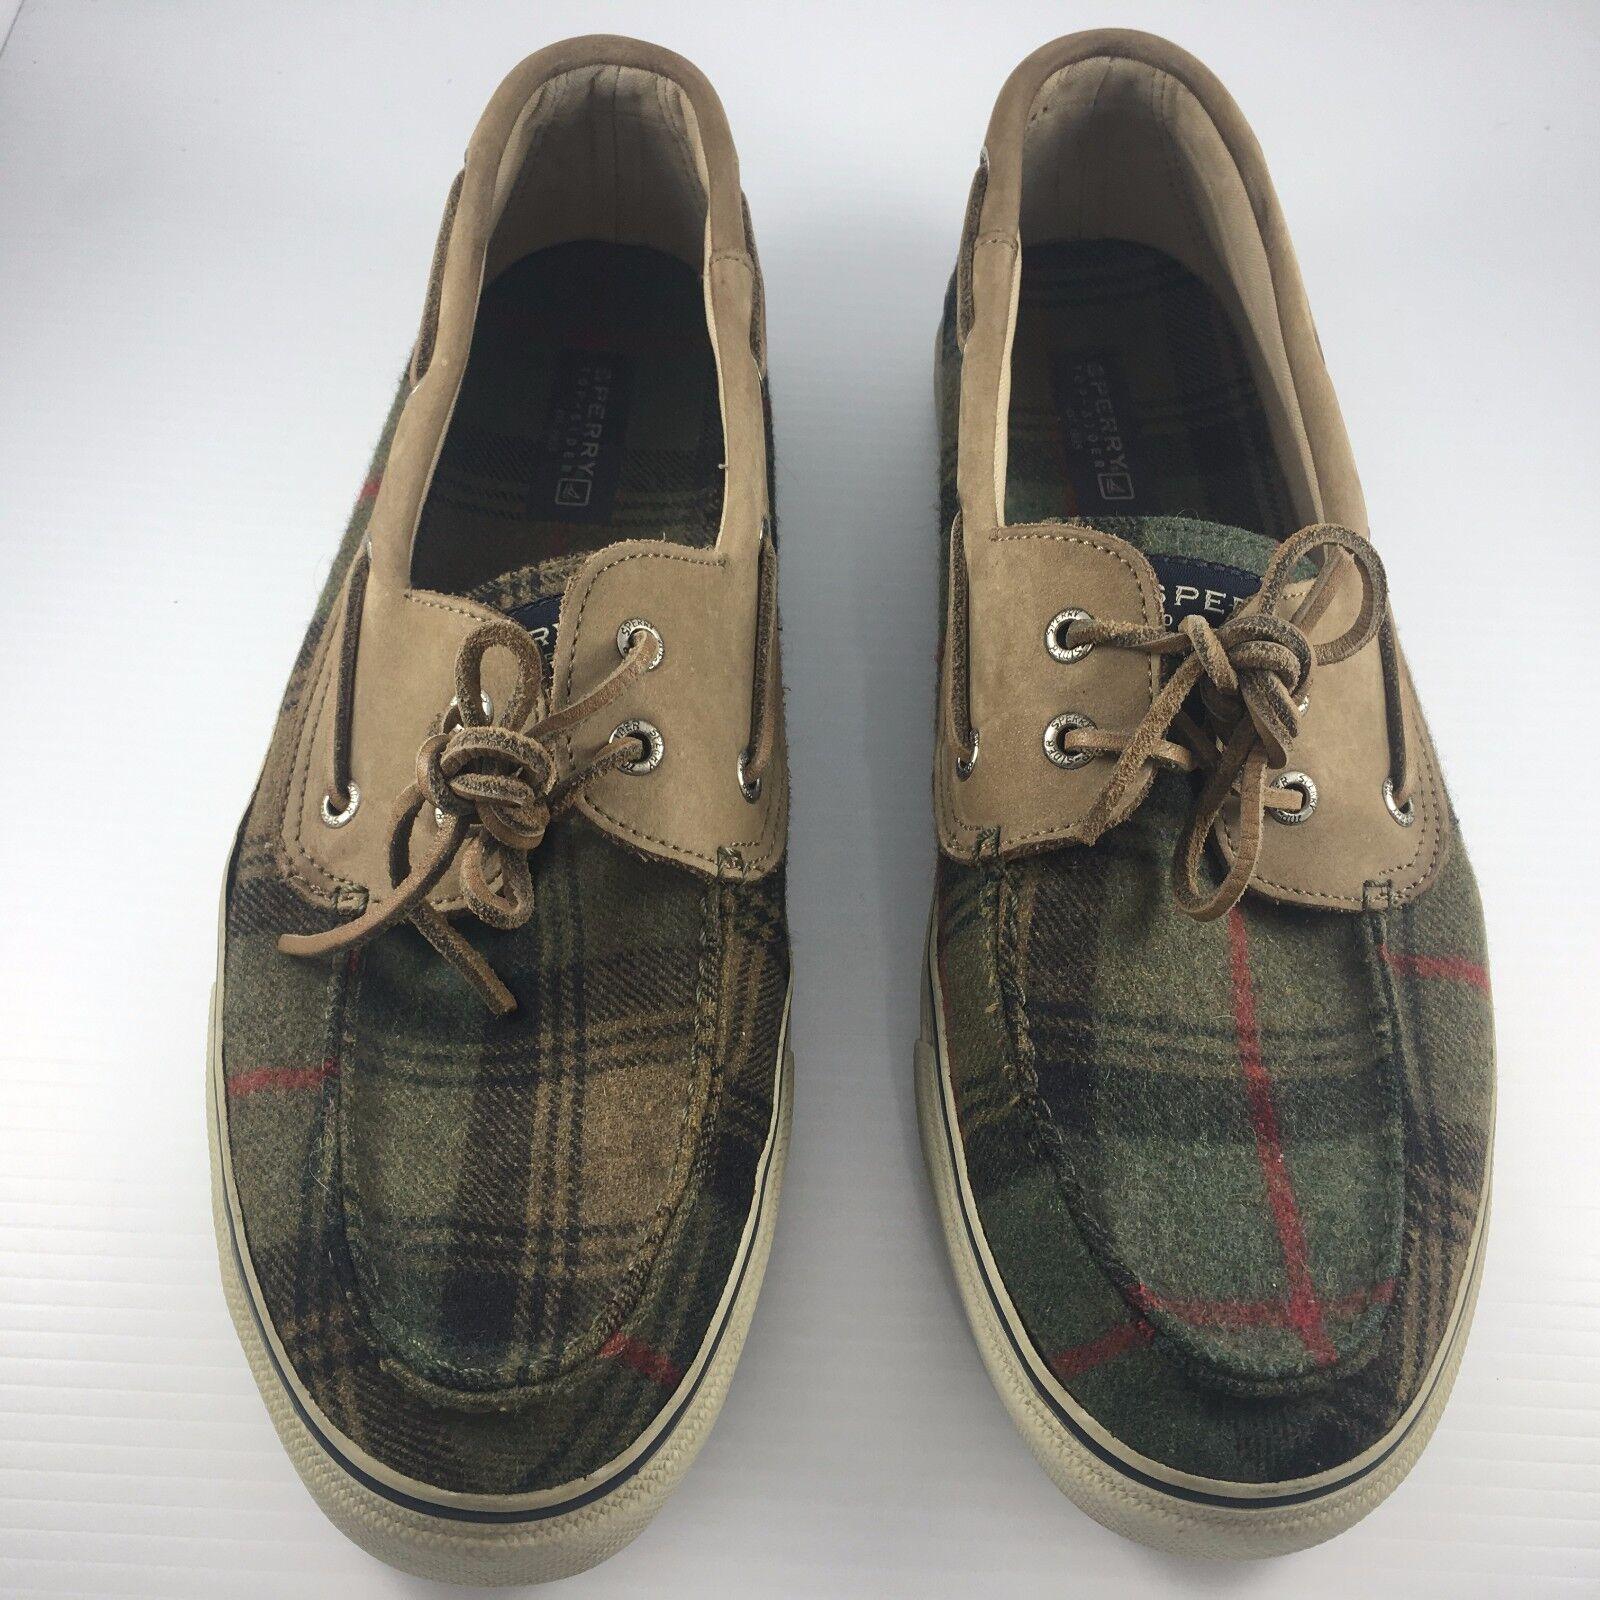 Sperry Top Sider Men US 13 Bahama Wool Plaid Green Plaid Wool 2 Eye Casual Boat Shoes e1f4f8